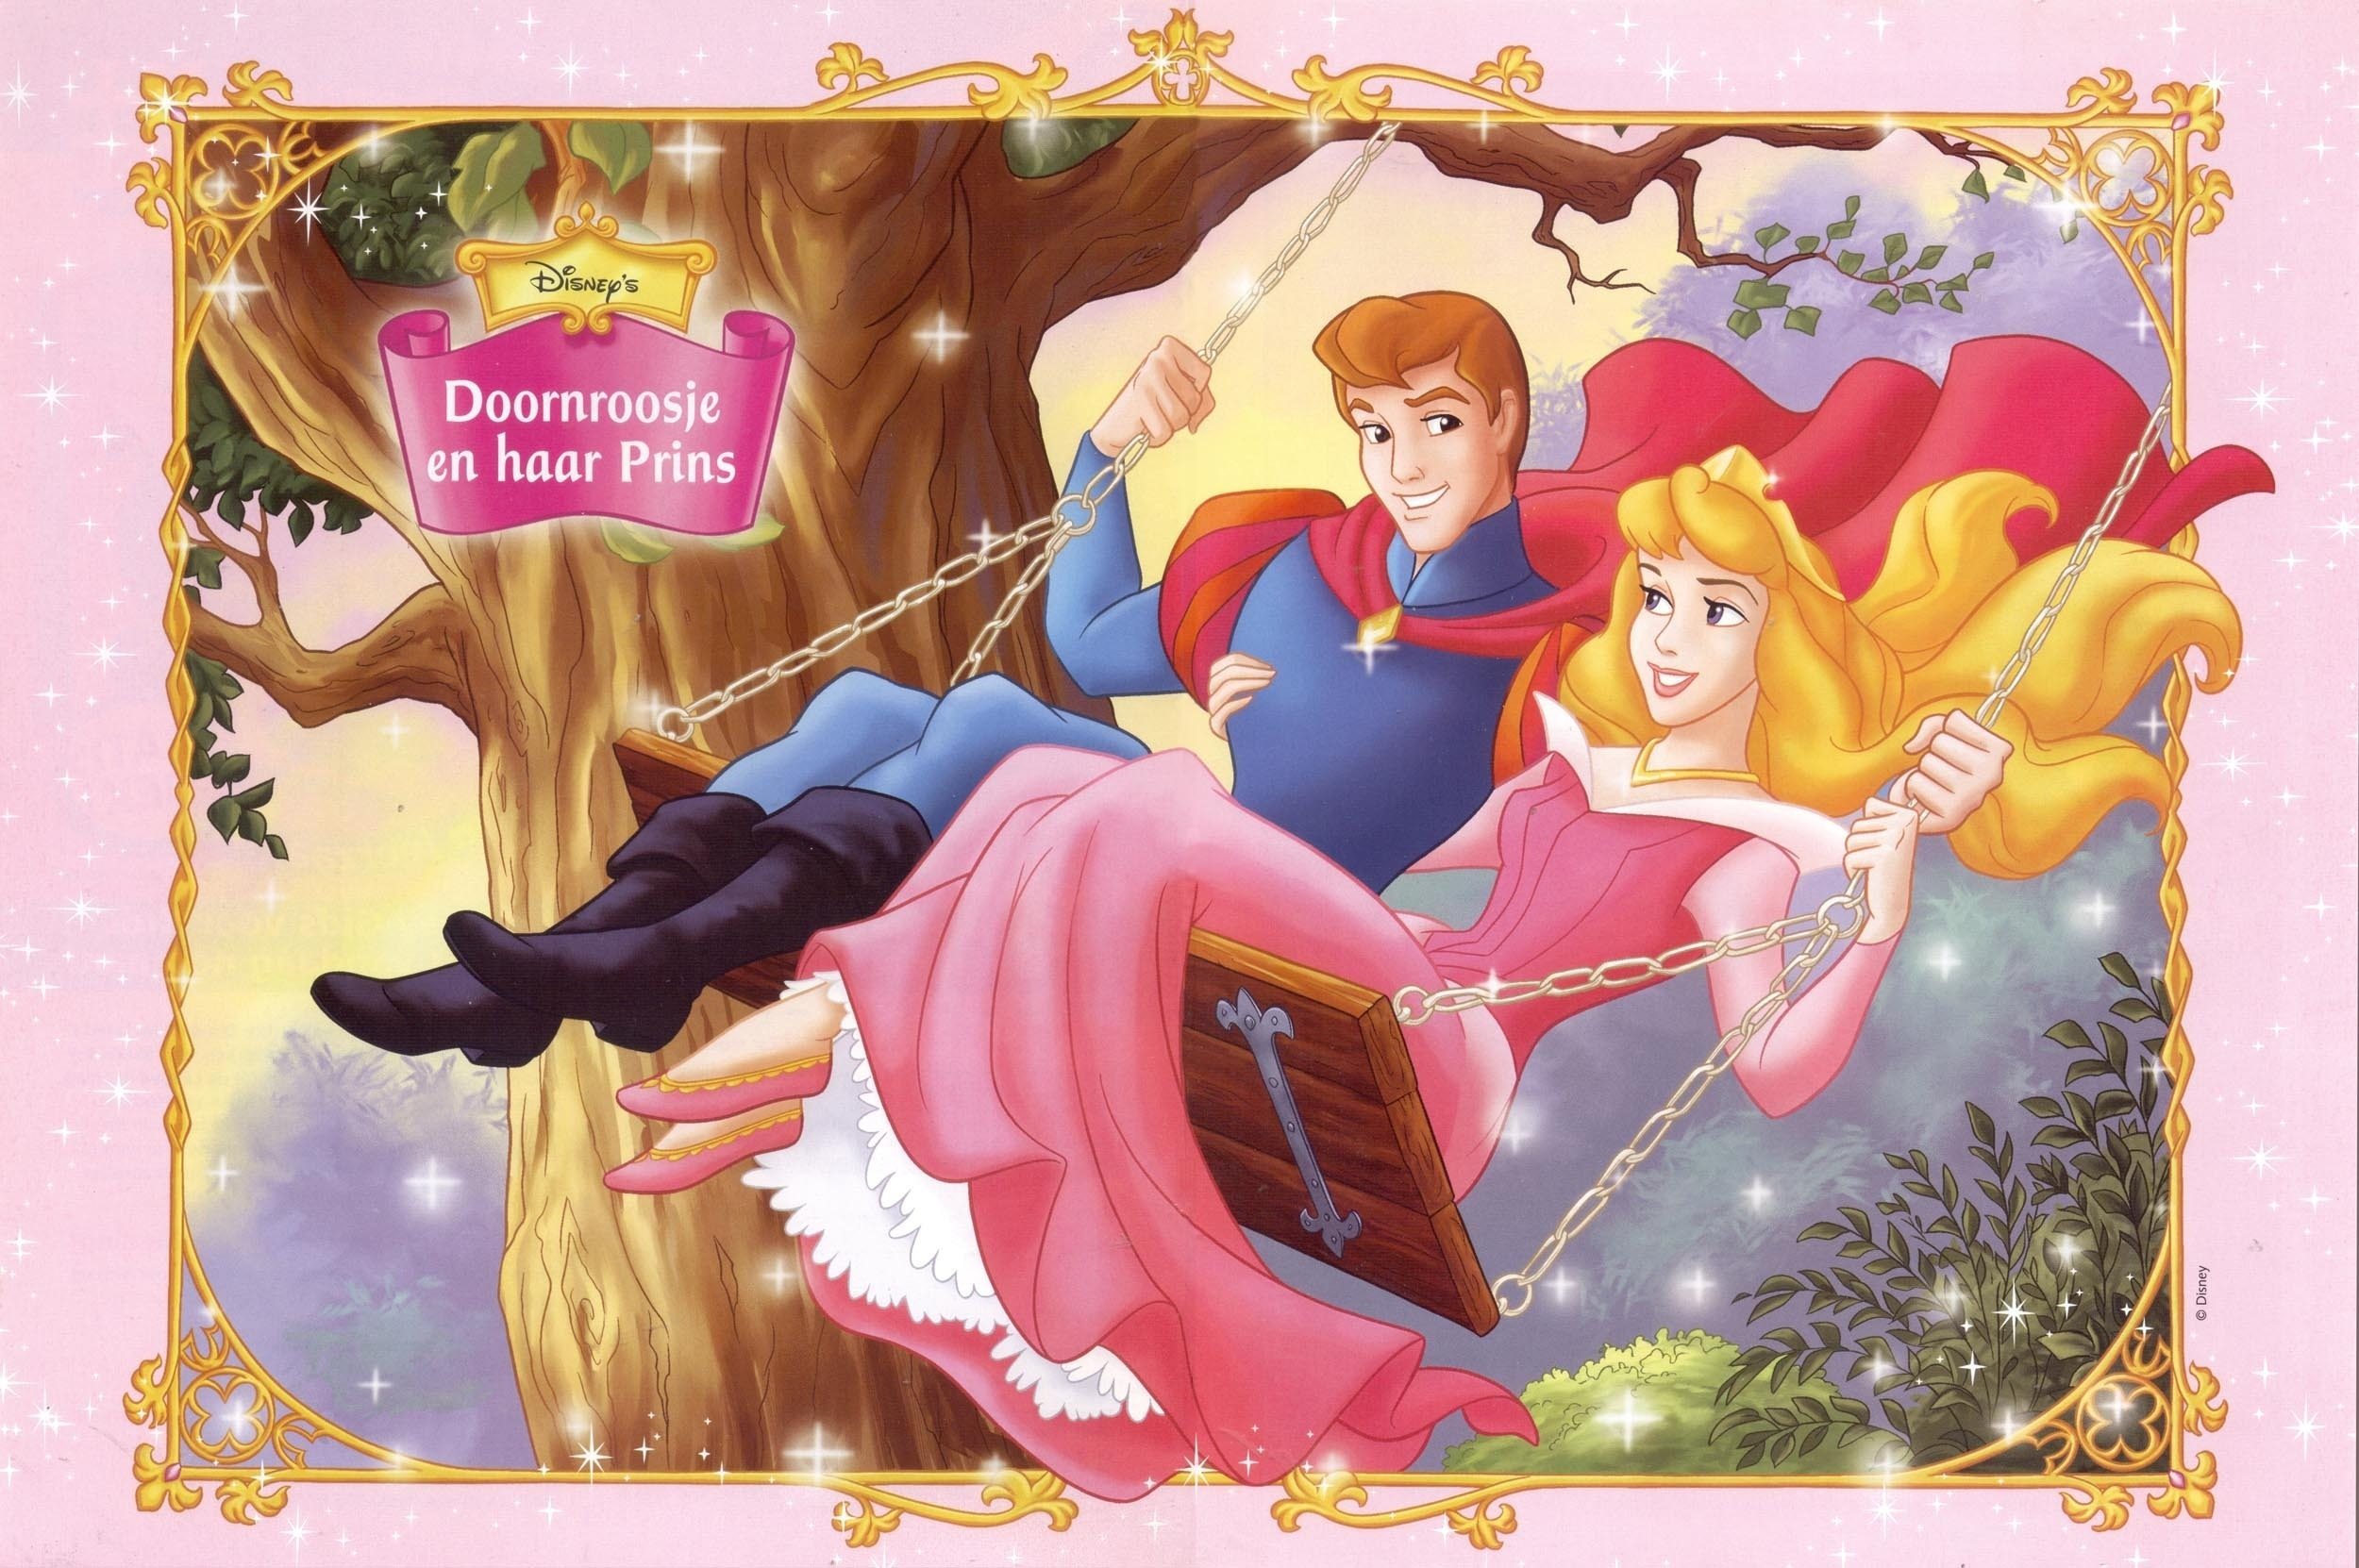 مكتبة ضخمة من صور ورمزيات اميرات ديزني Princess-Aurora-disney-princess-9546151-2500-1662